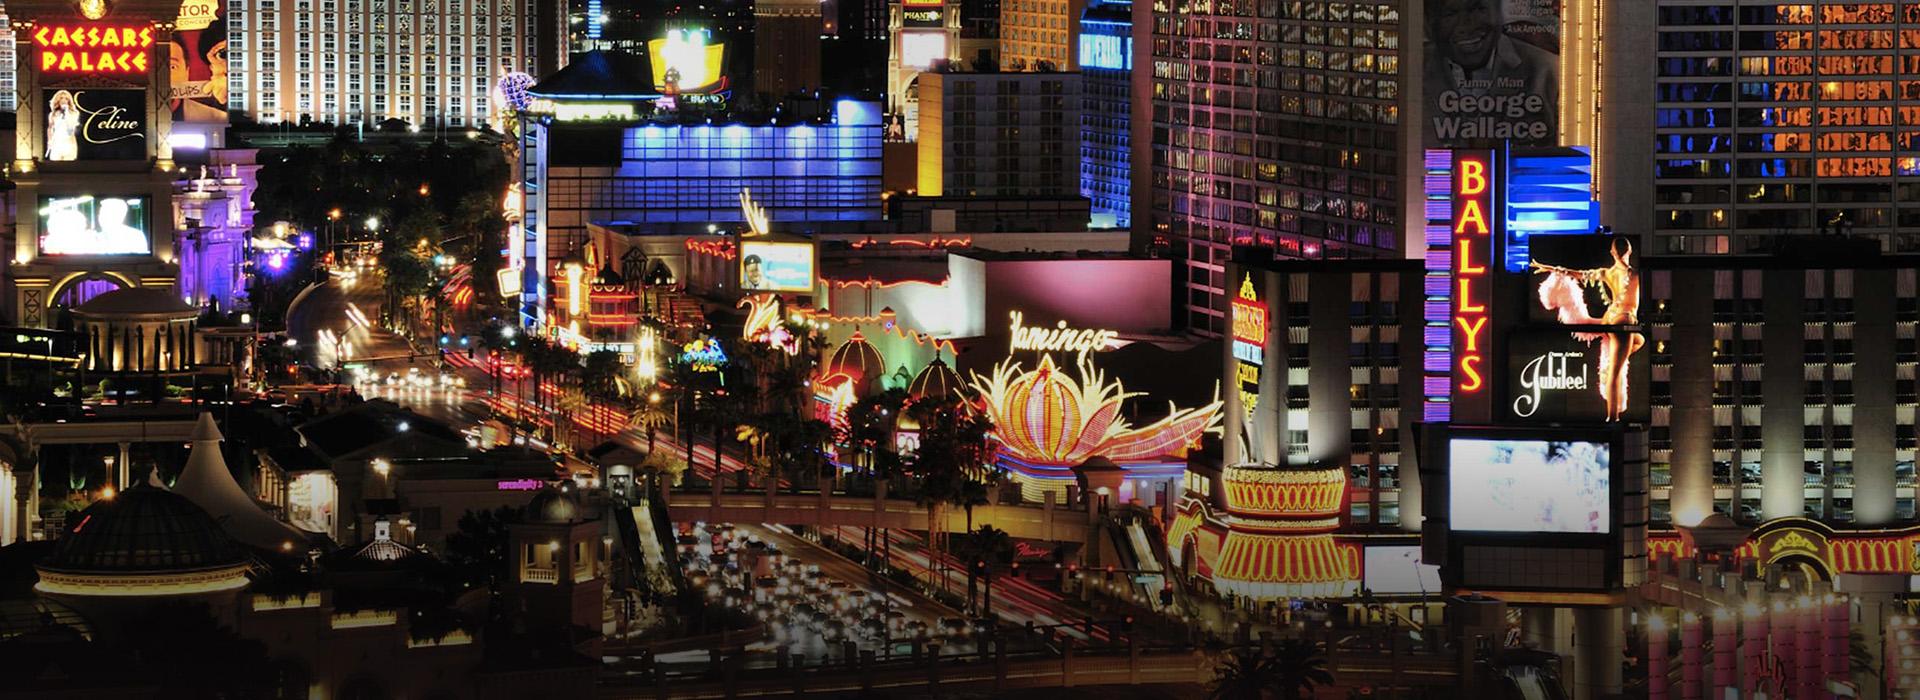 Las Vegas Flugzeit